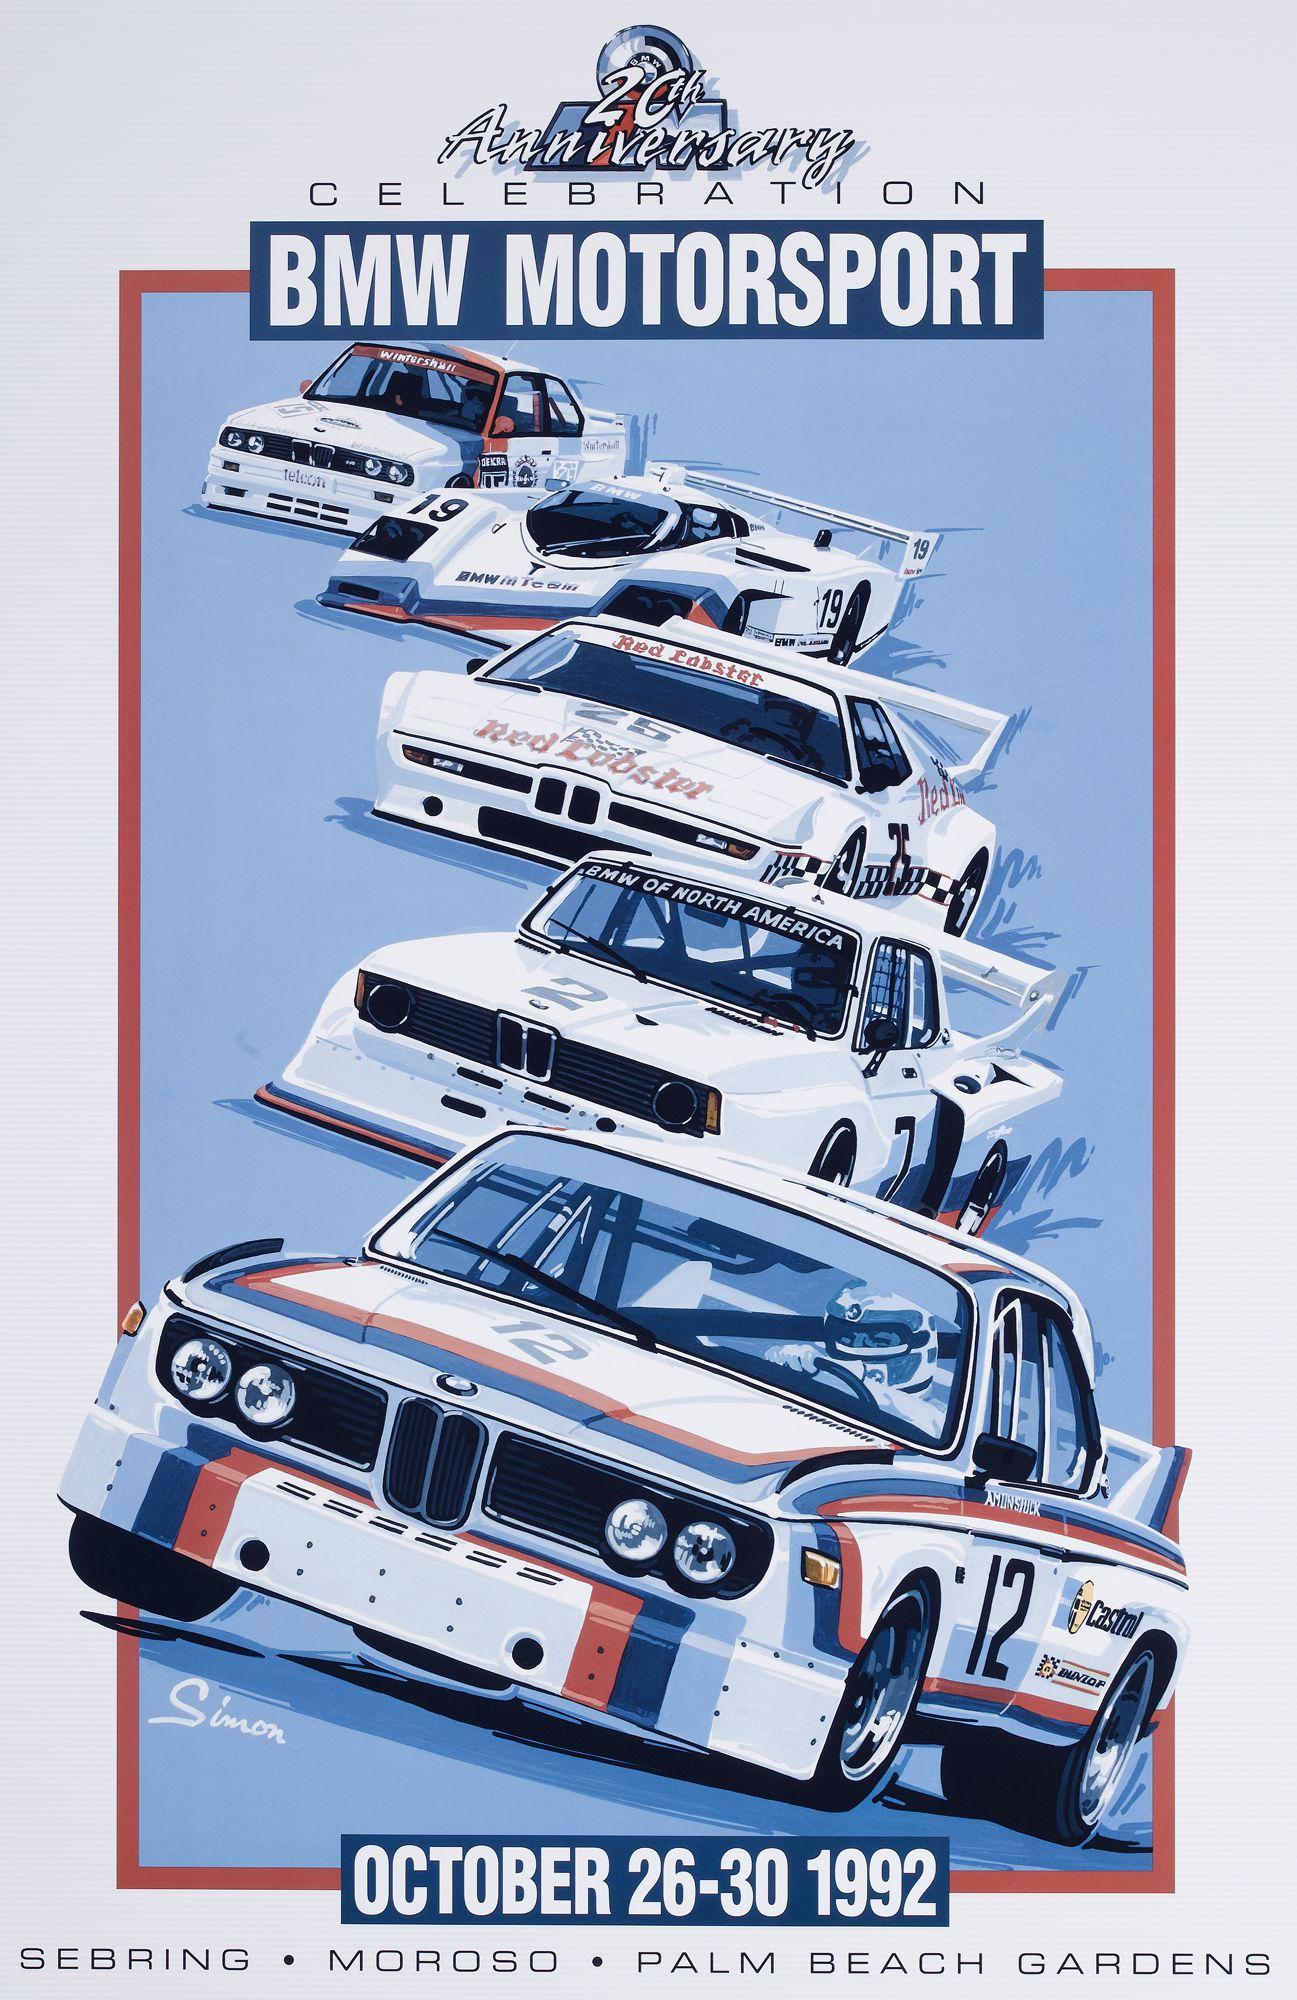 BMW Motorsport Vintage style poster by Dennis Simon... I ...